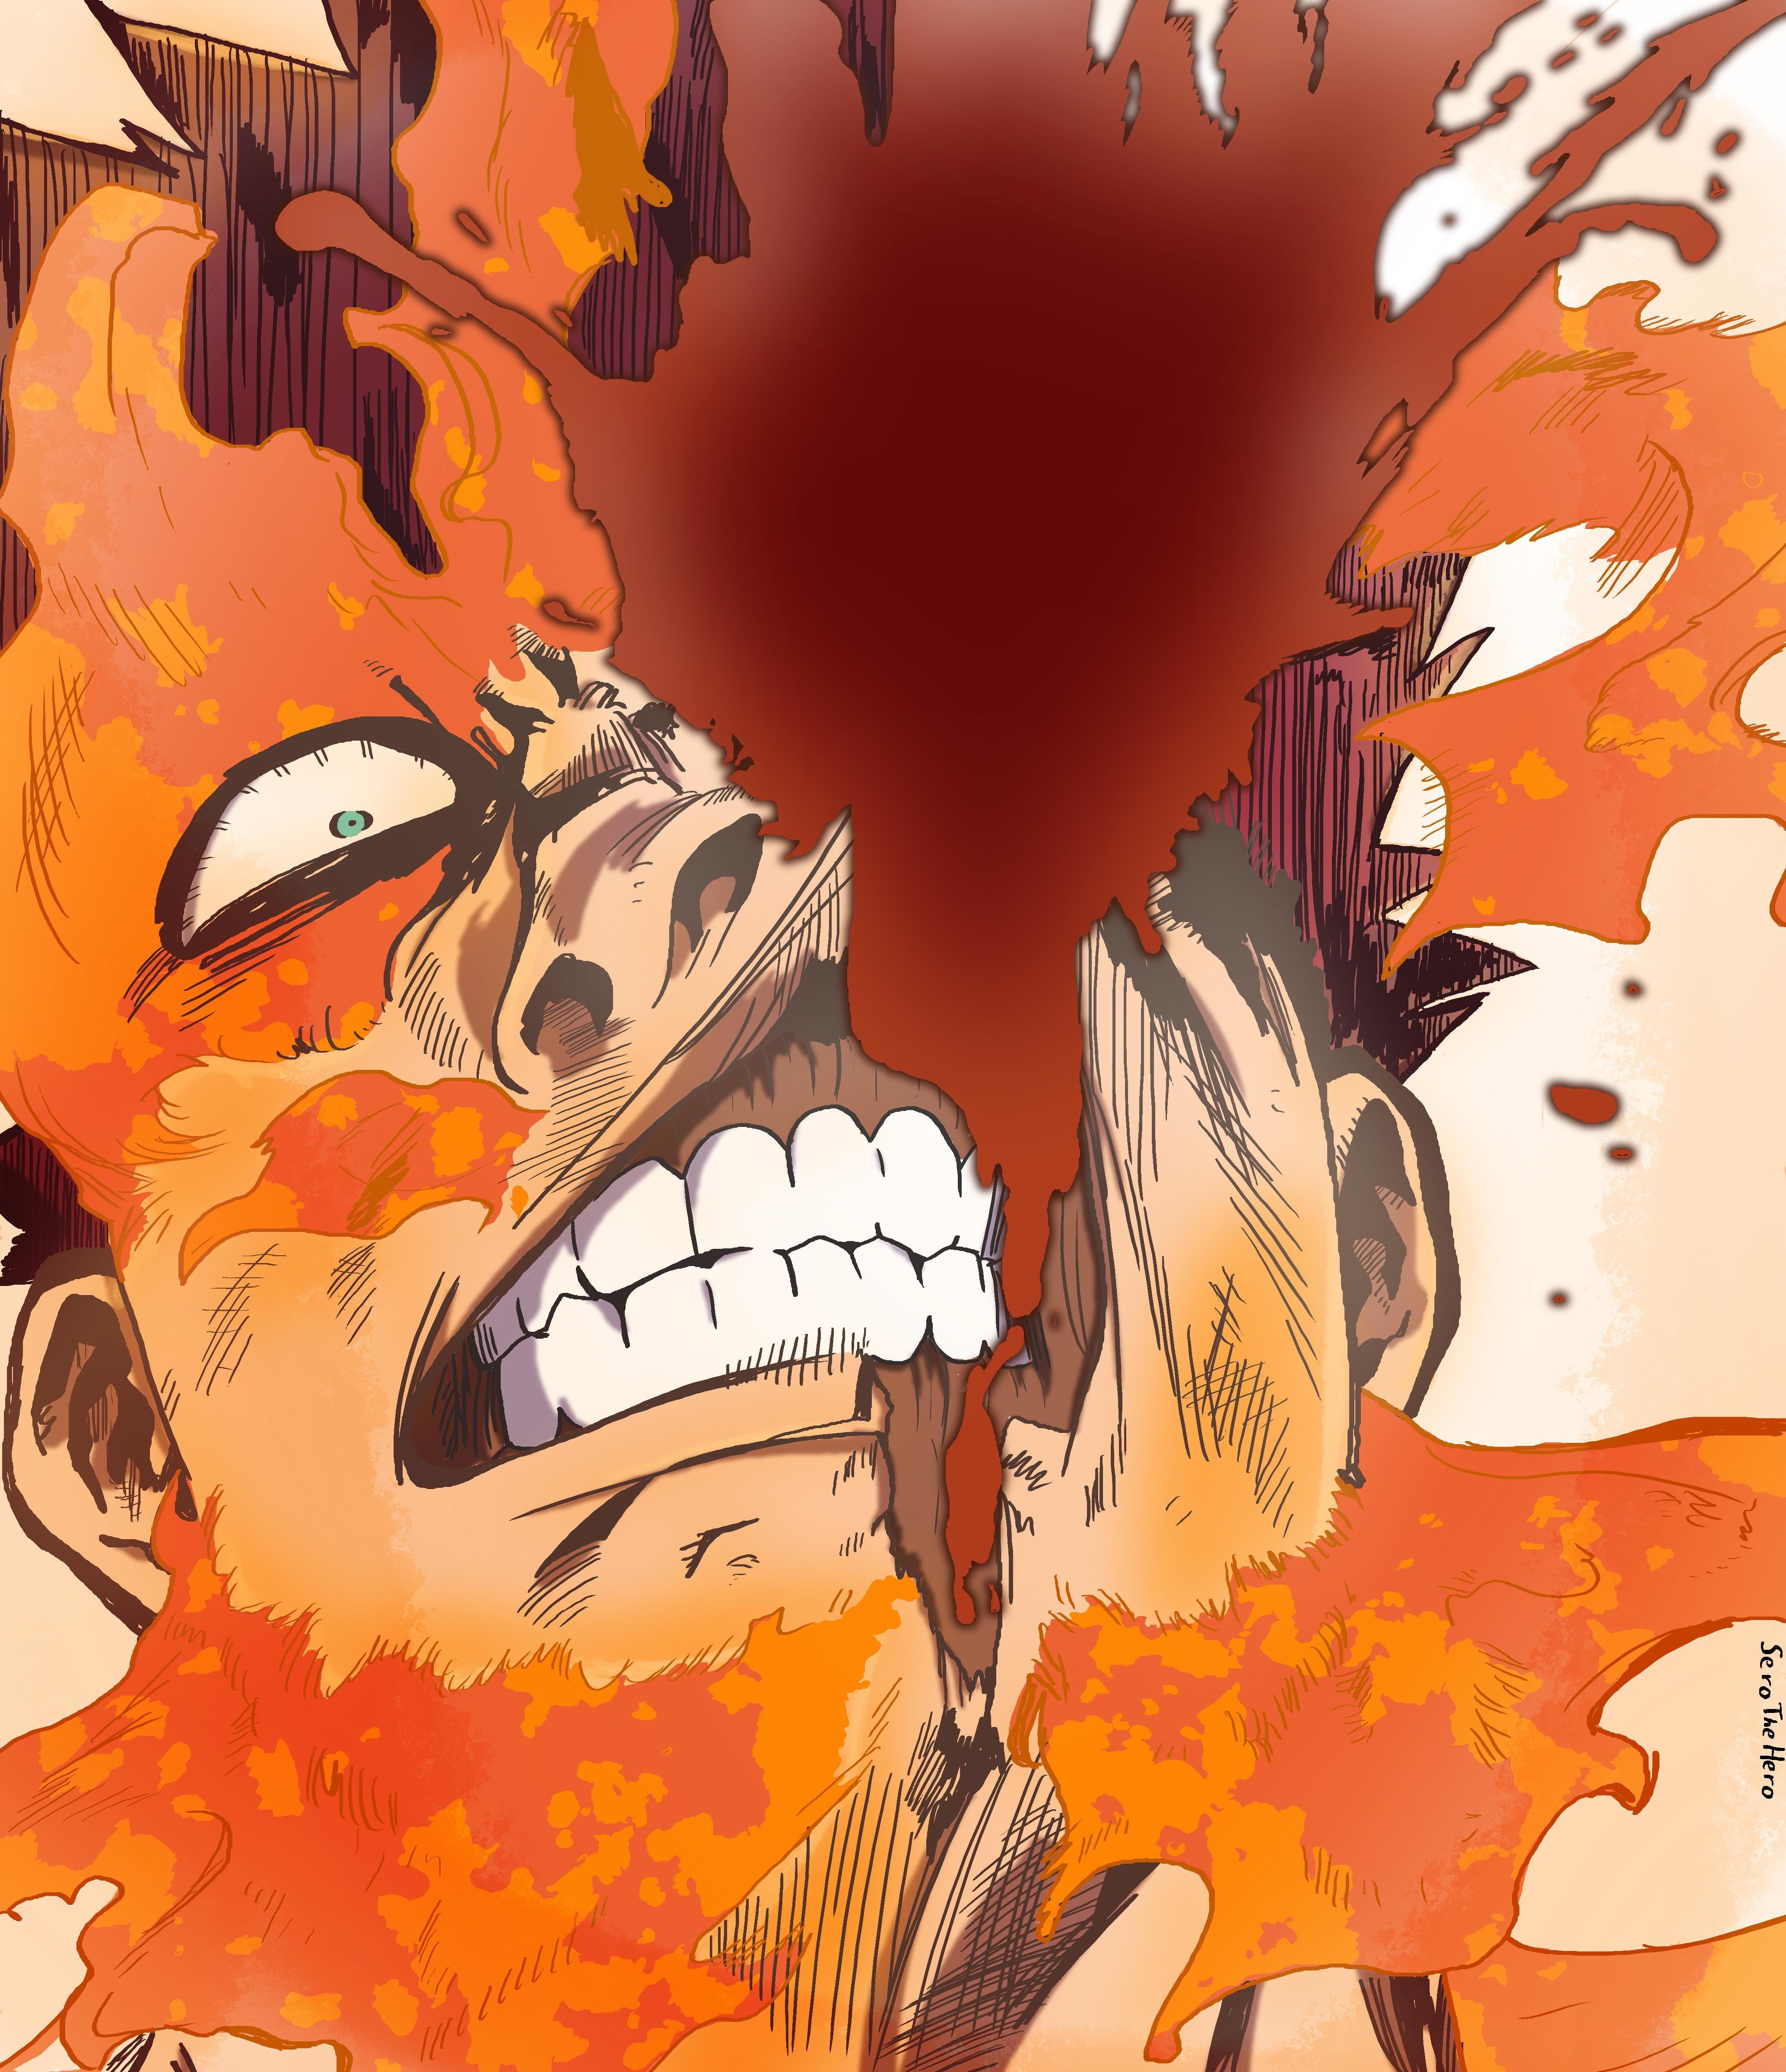 My Hero Academia The Manga Endeavor Yikes Didn T Expect That Coming My Hero My Hero Academia My Hero Academia Manga